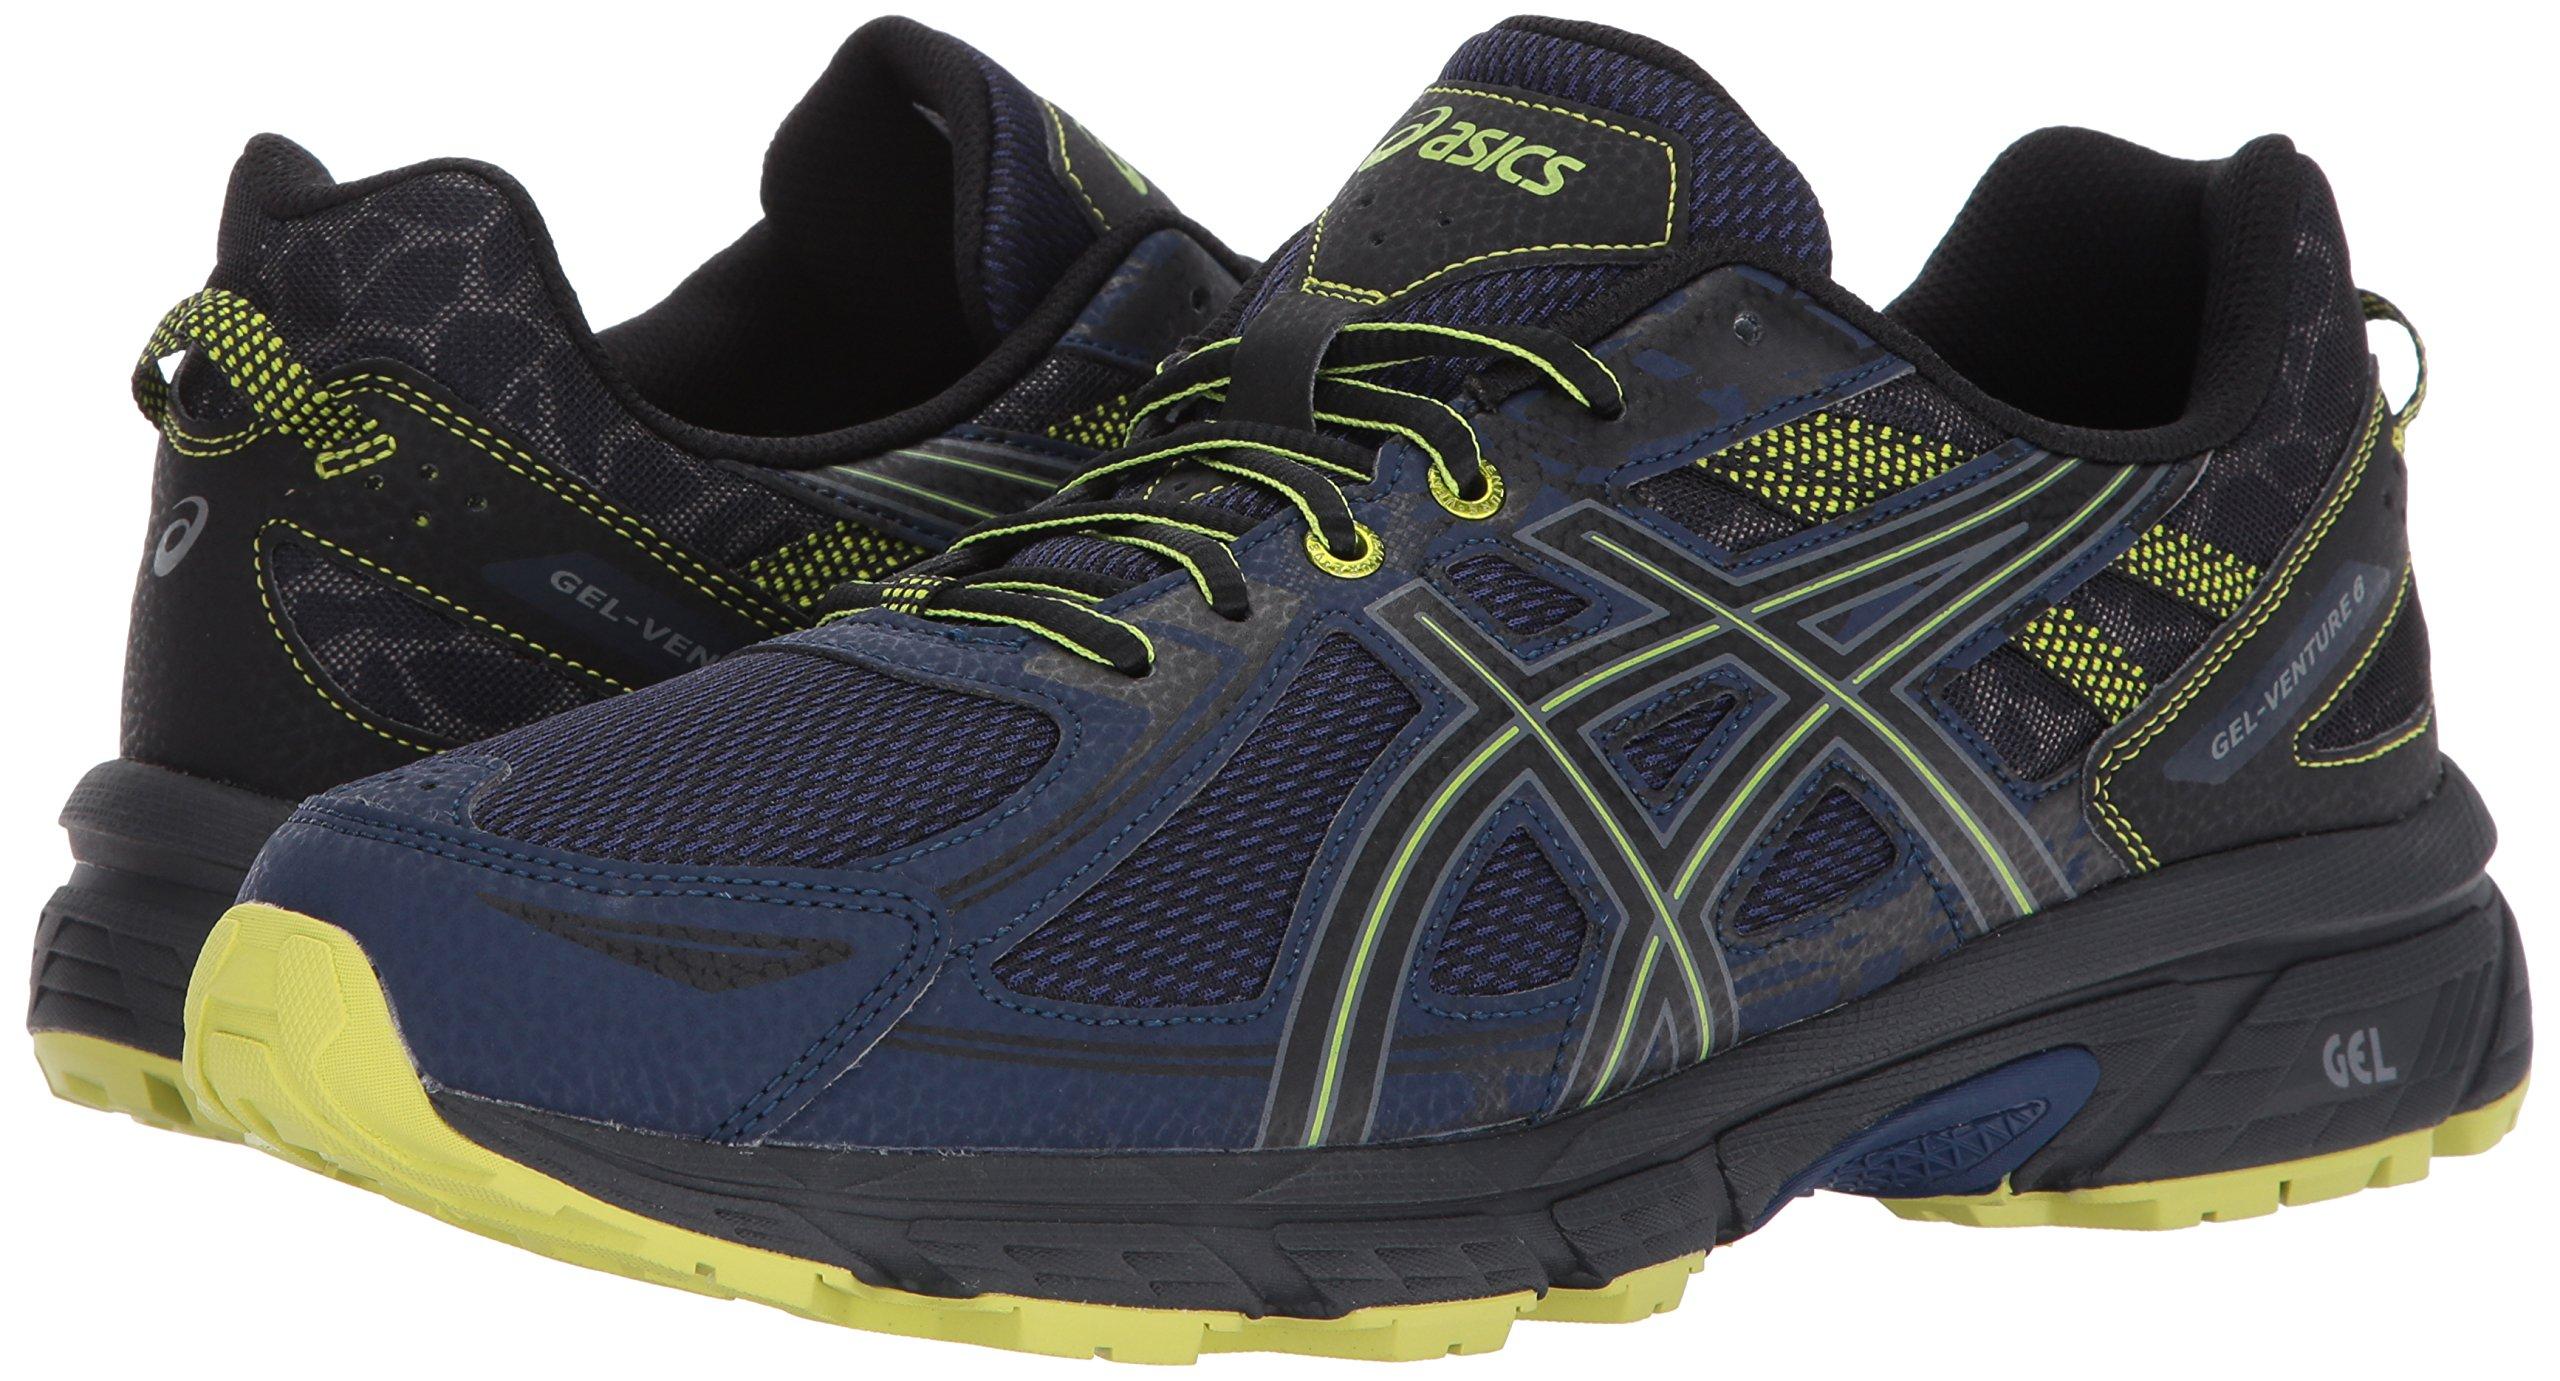 ASICS Mens Gel-Venture 6 Running Shoe, Indigo Blue/Black/Energy Green, 7 Medium US by ASICS (Image #6)